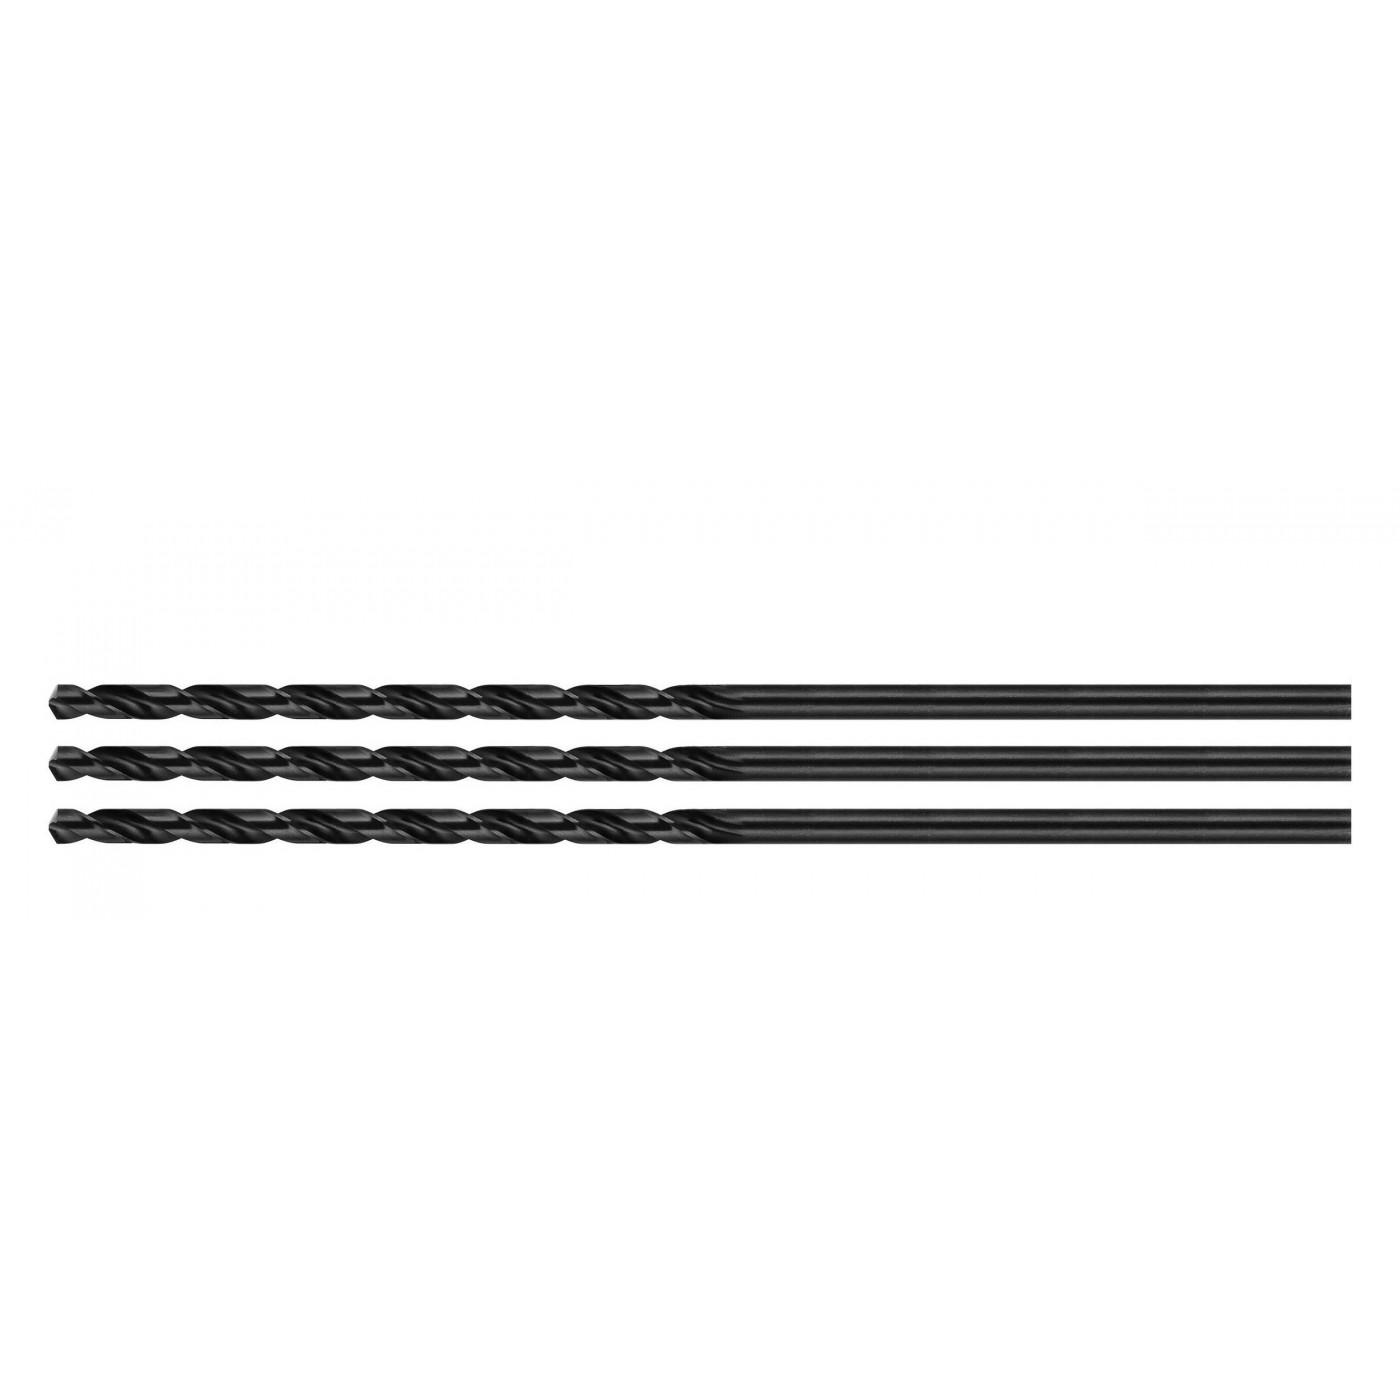 Set of 3 metal drill bits, extra long (5.5x350 mm)  - 1